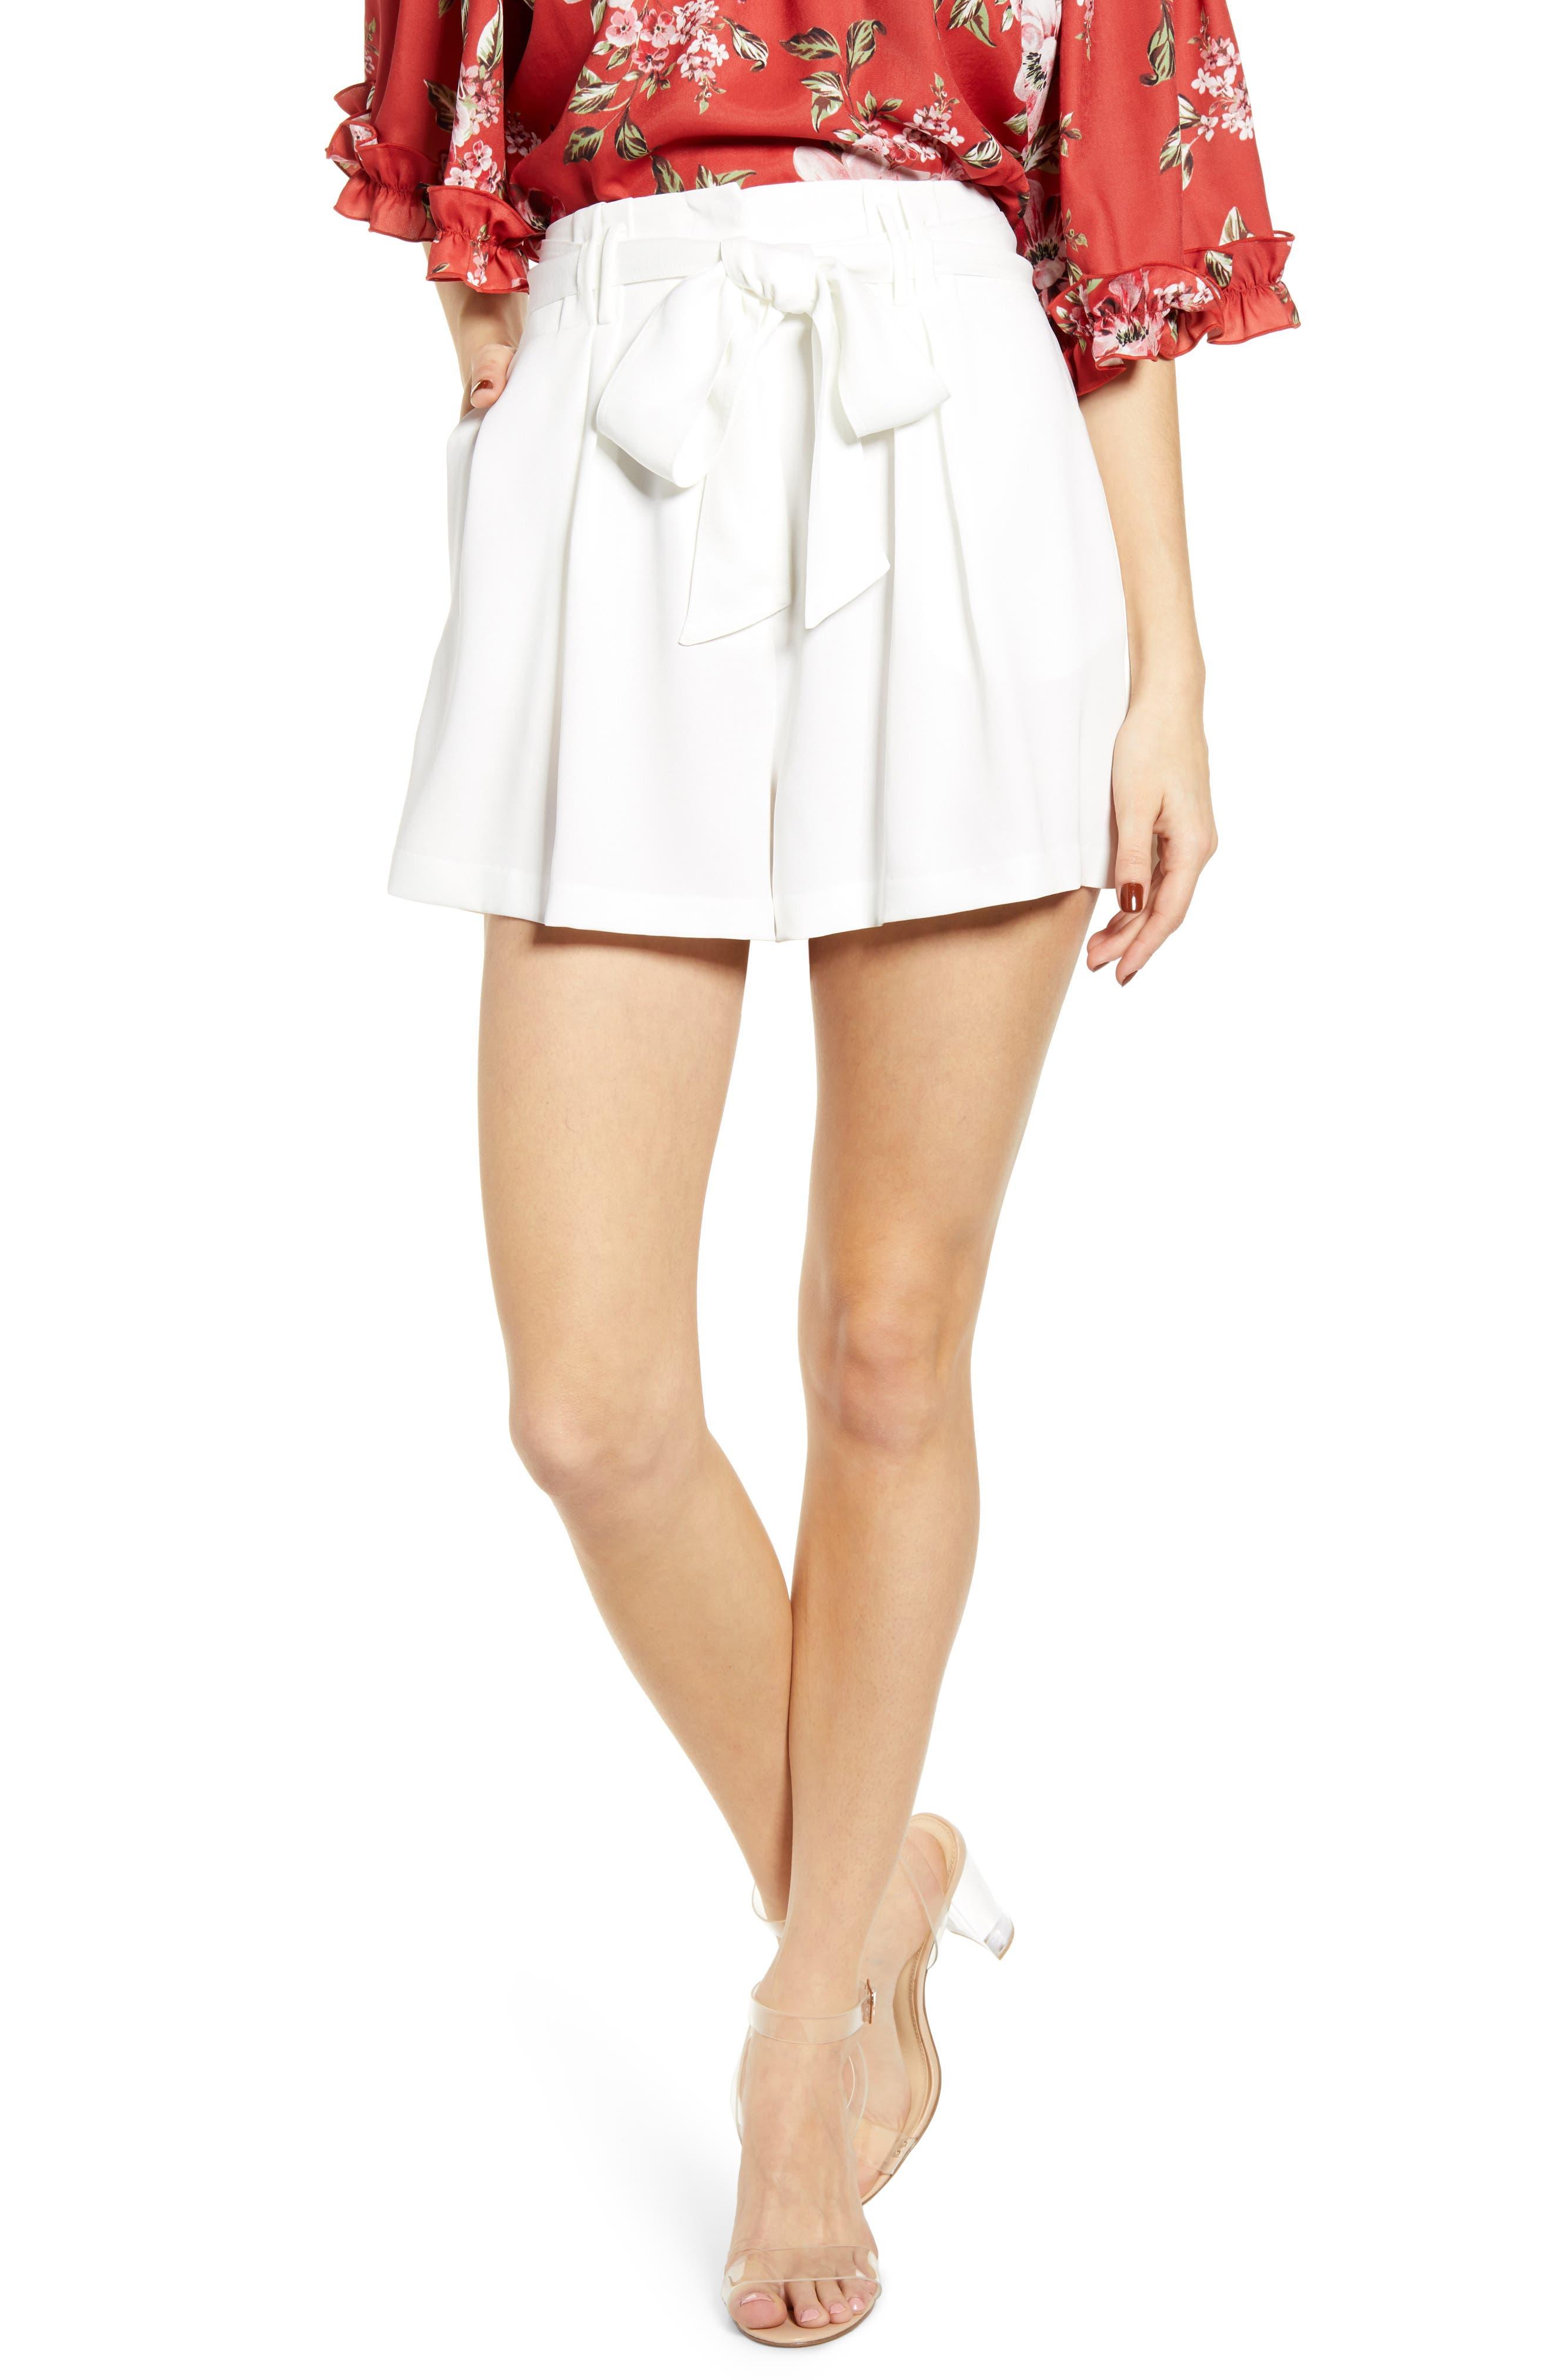 Vintage High Waisted Shorts, Sailor Shorts, Retro Shorts Womens Wayf Pleated Tie Waist Shorts $79.00 AT vintagedancer.com